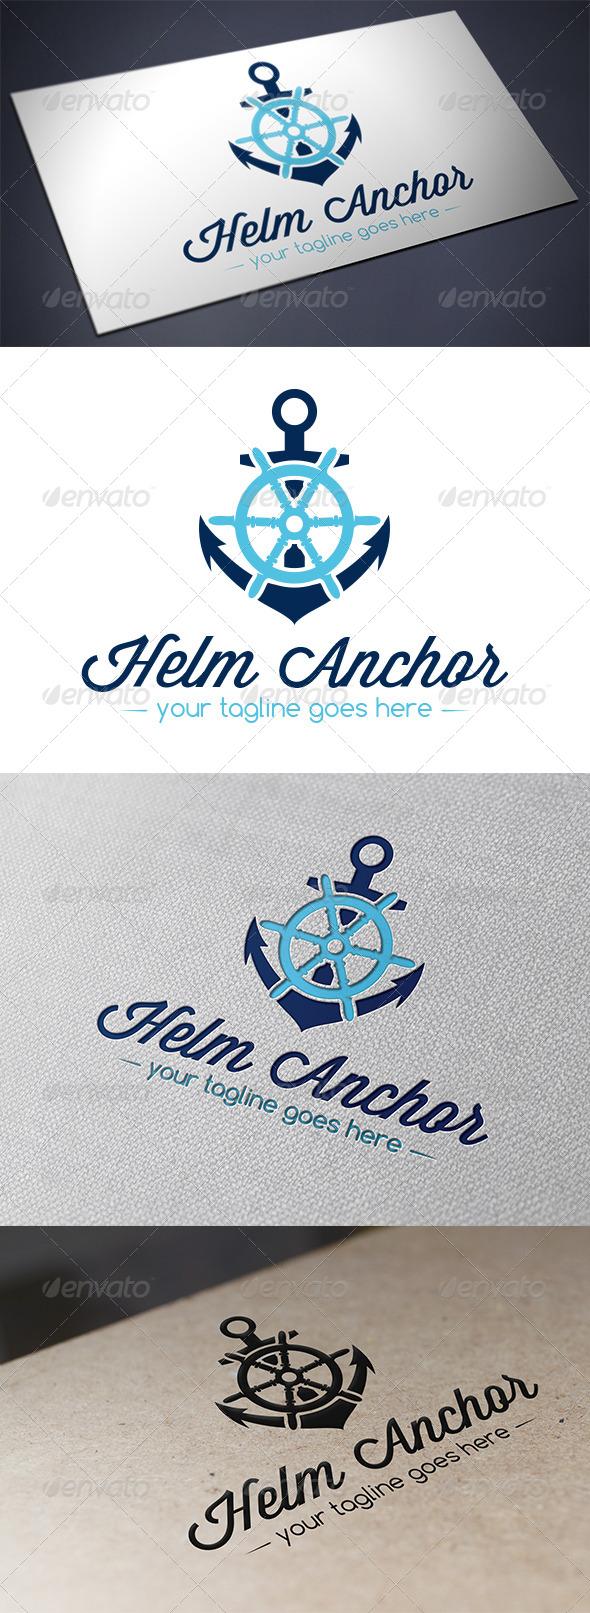 GraphicRiver Helm Anchor Logo Template 5709186